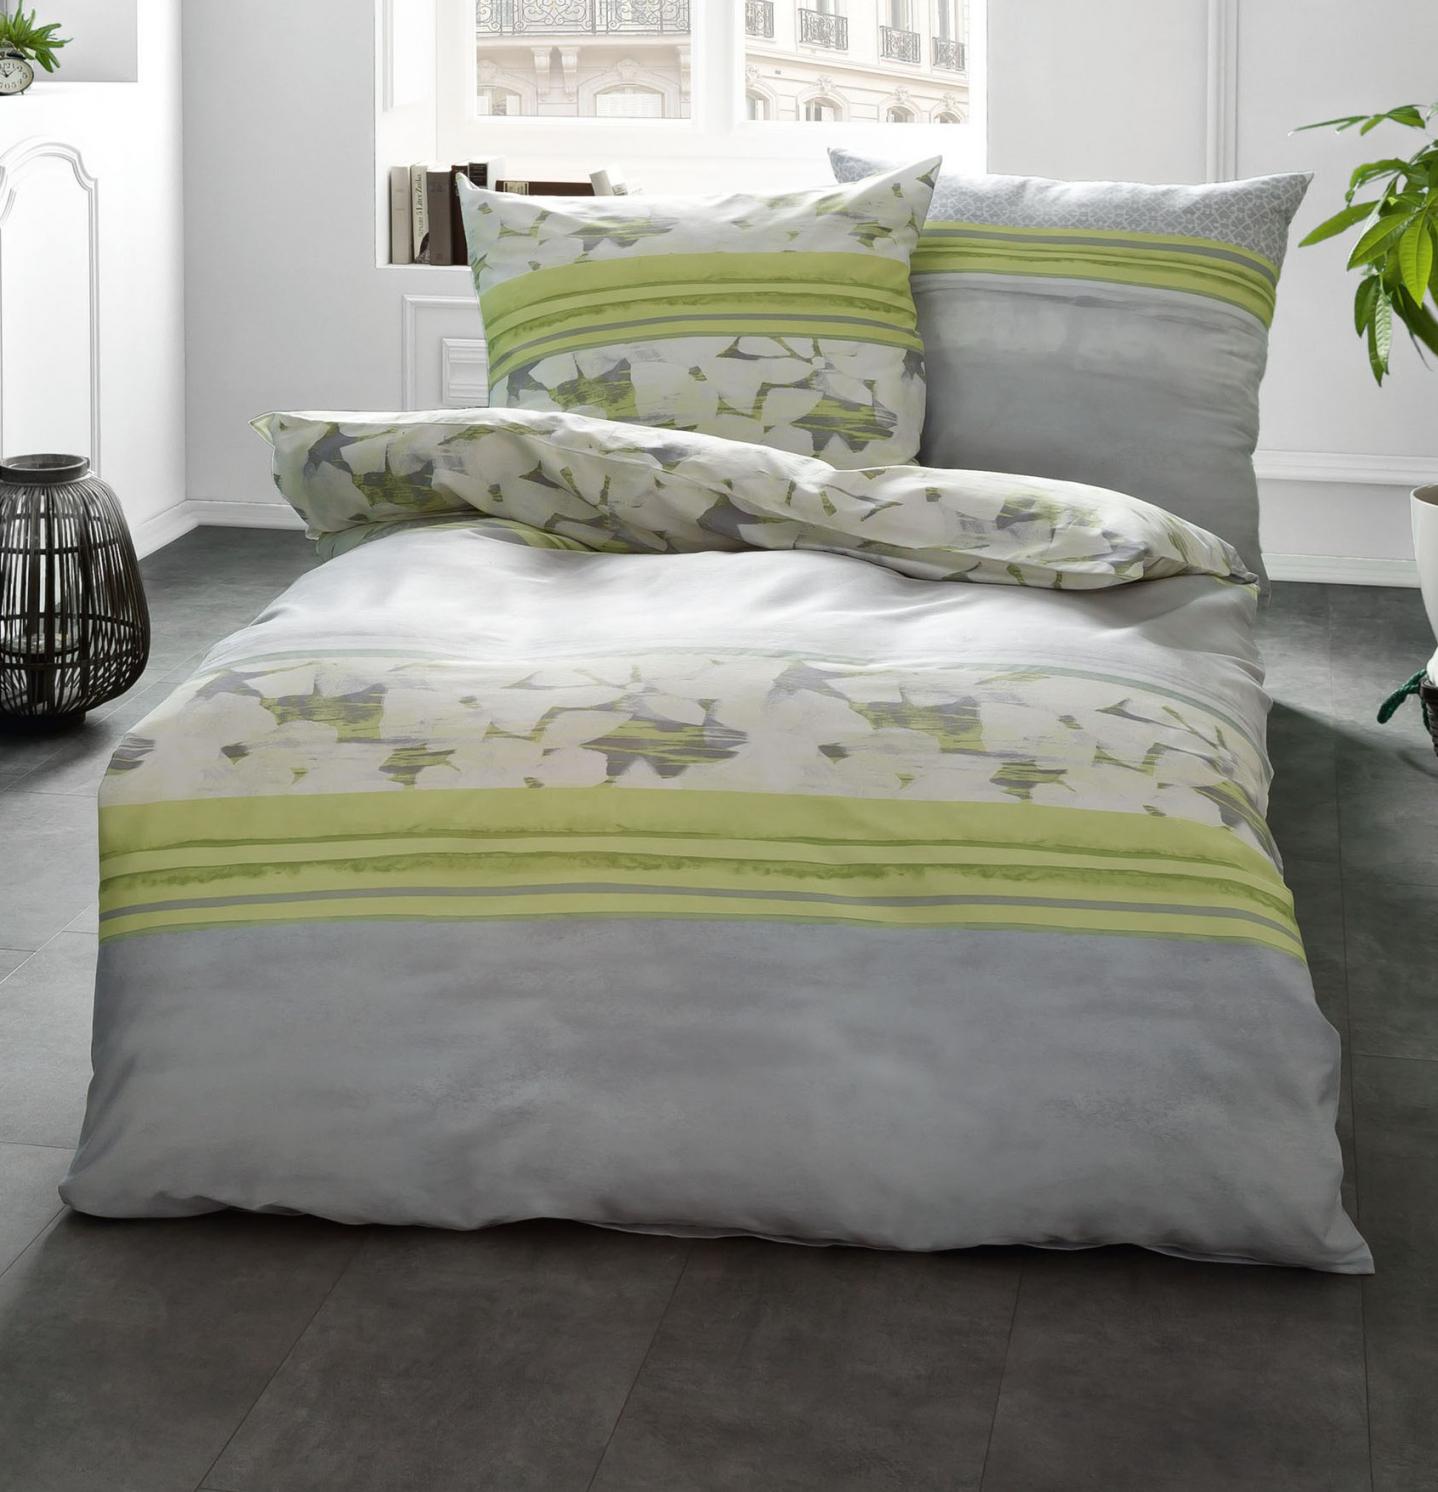 Vibrant Idea Bettwasche Bedrucken Lassen  Wwwkhoddam von Bettwäsche Bedrucken Lassen Text Photo